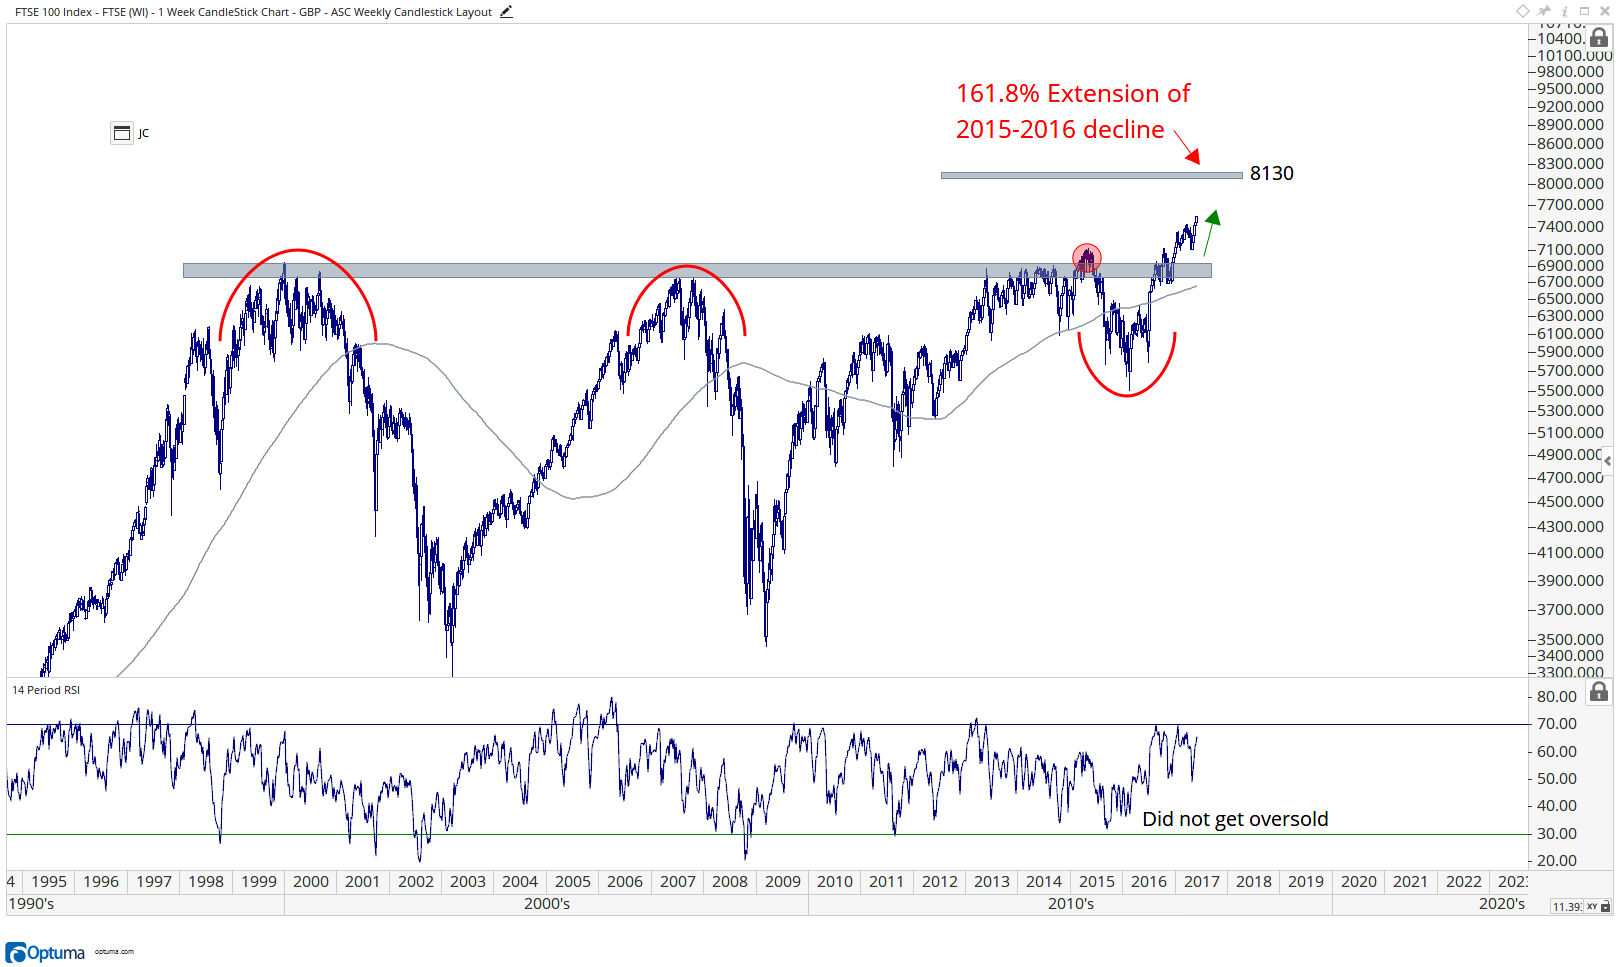 London FTSE 100 Index